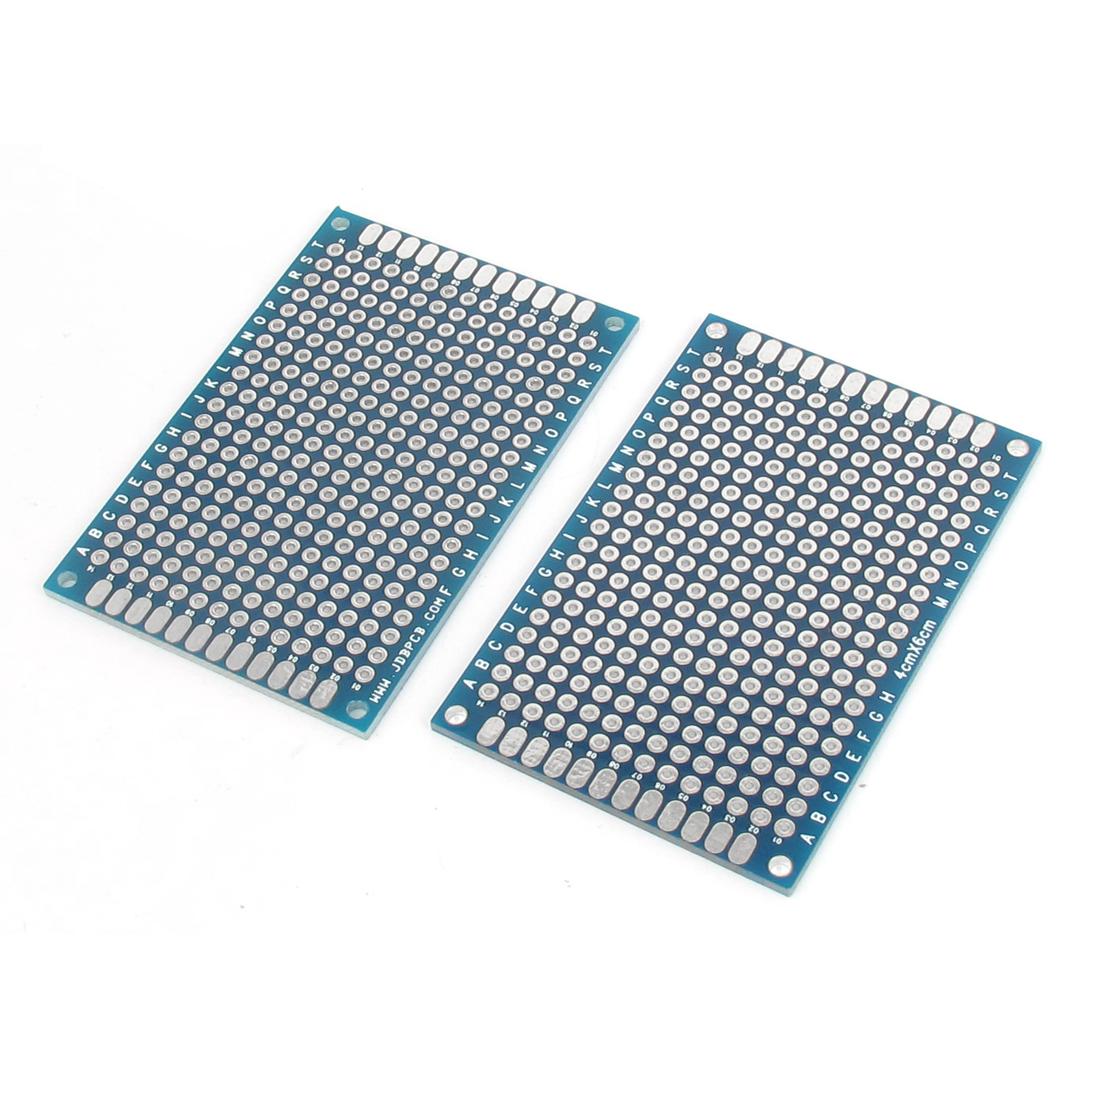 2pcs 4cm x 6cm Dual Sided Prototype Universal PCB Printed Circuit Board Breadboard